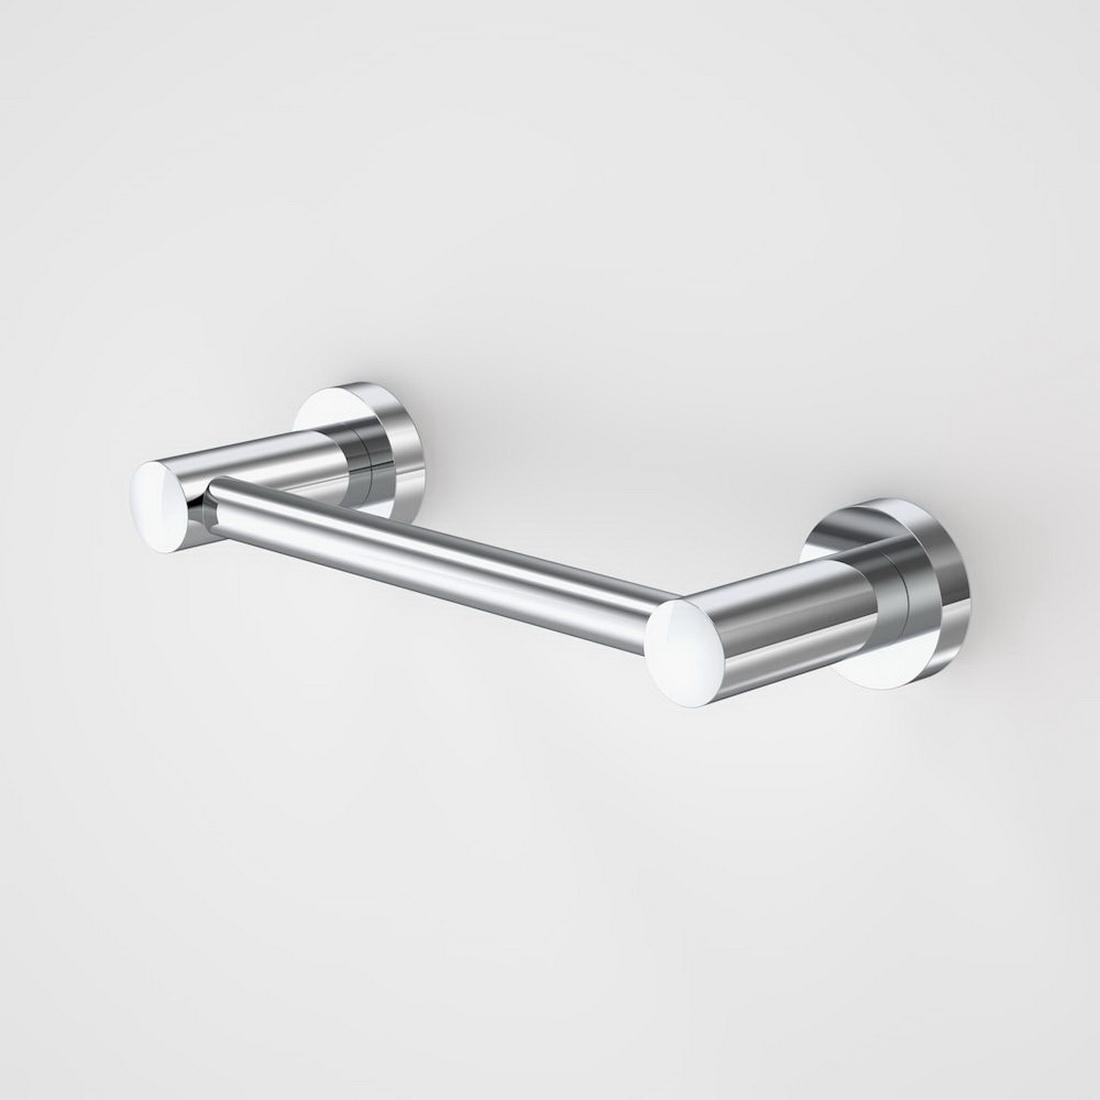 Cosmo Metal Hand Towel Rail 200mm Chrome 308128C